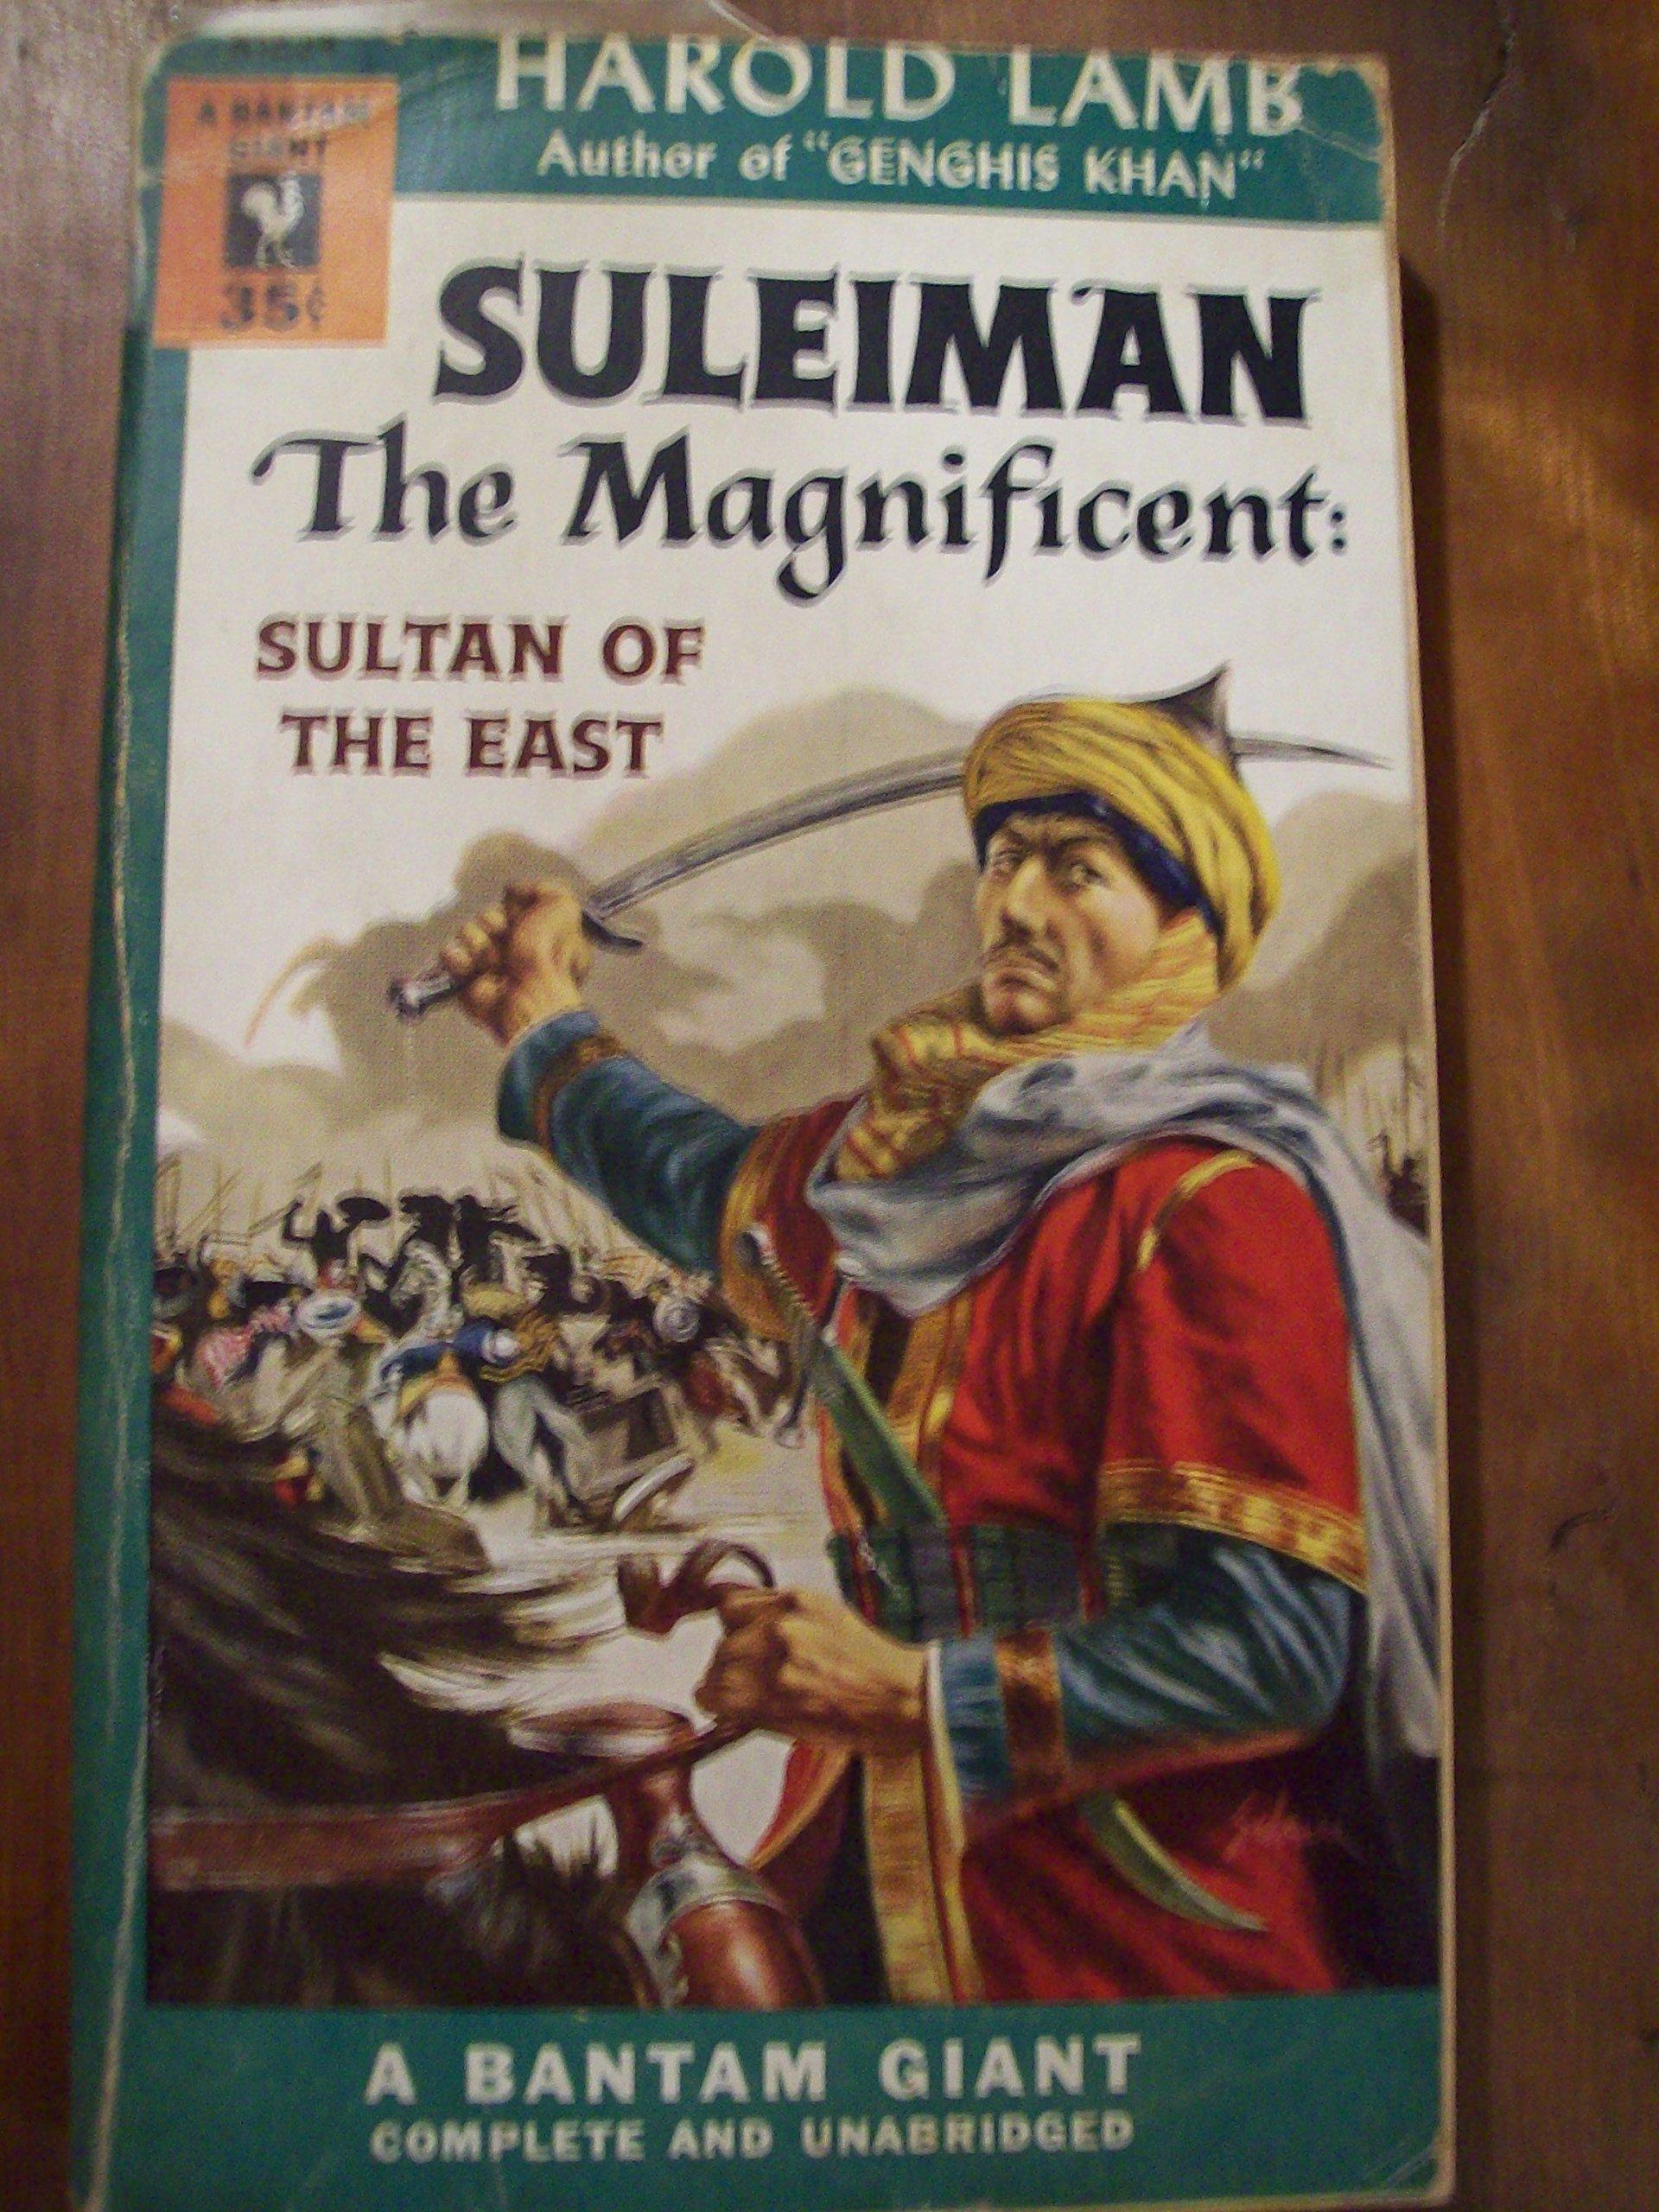 Suleiman the Magnificent: Sultan of the East: Harold Lamb: Amazon.com: Books